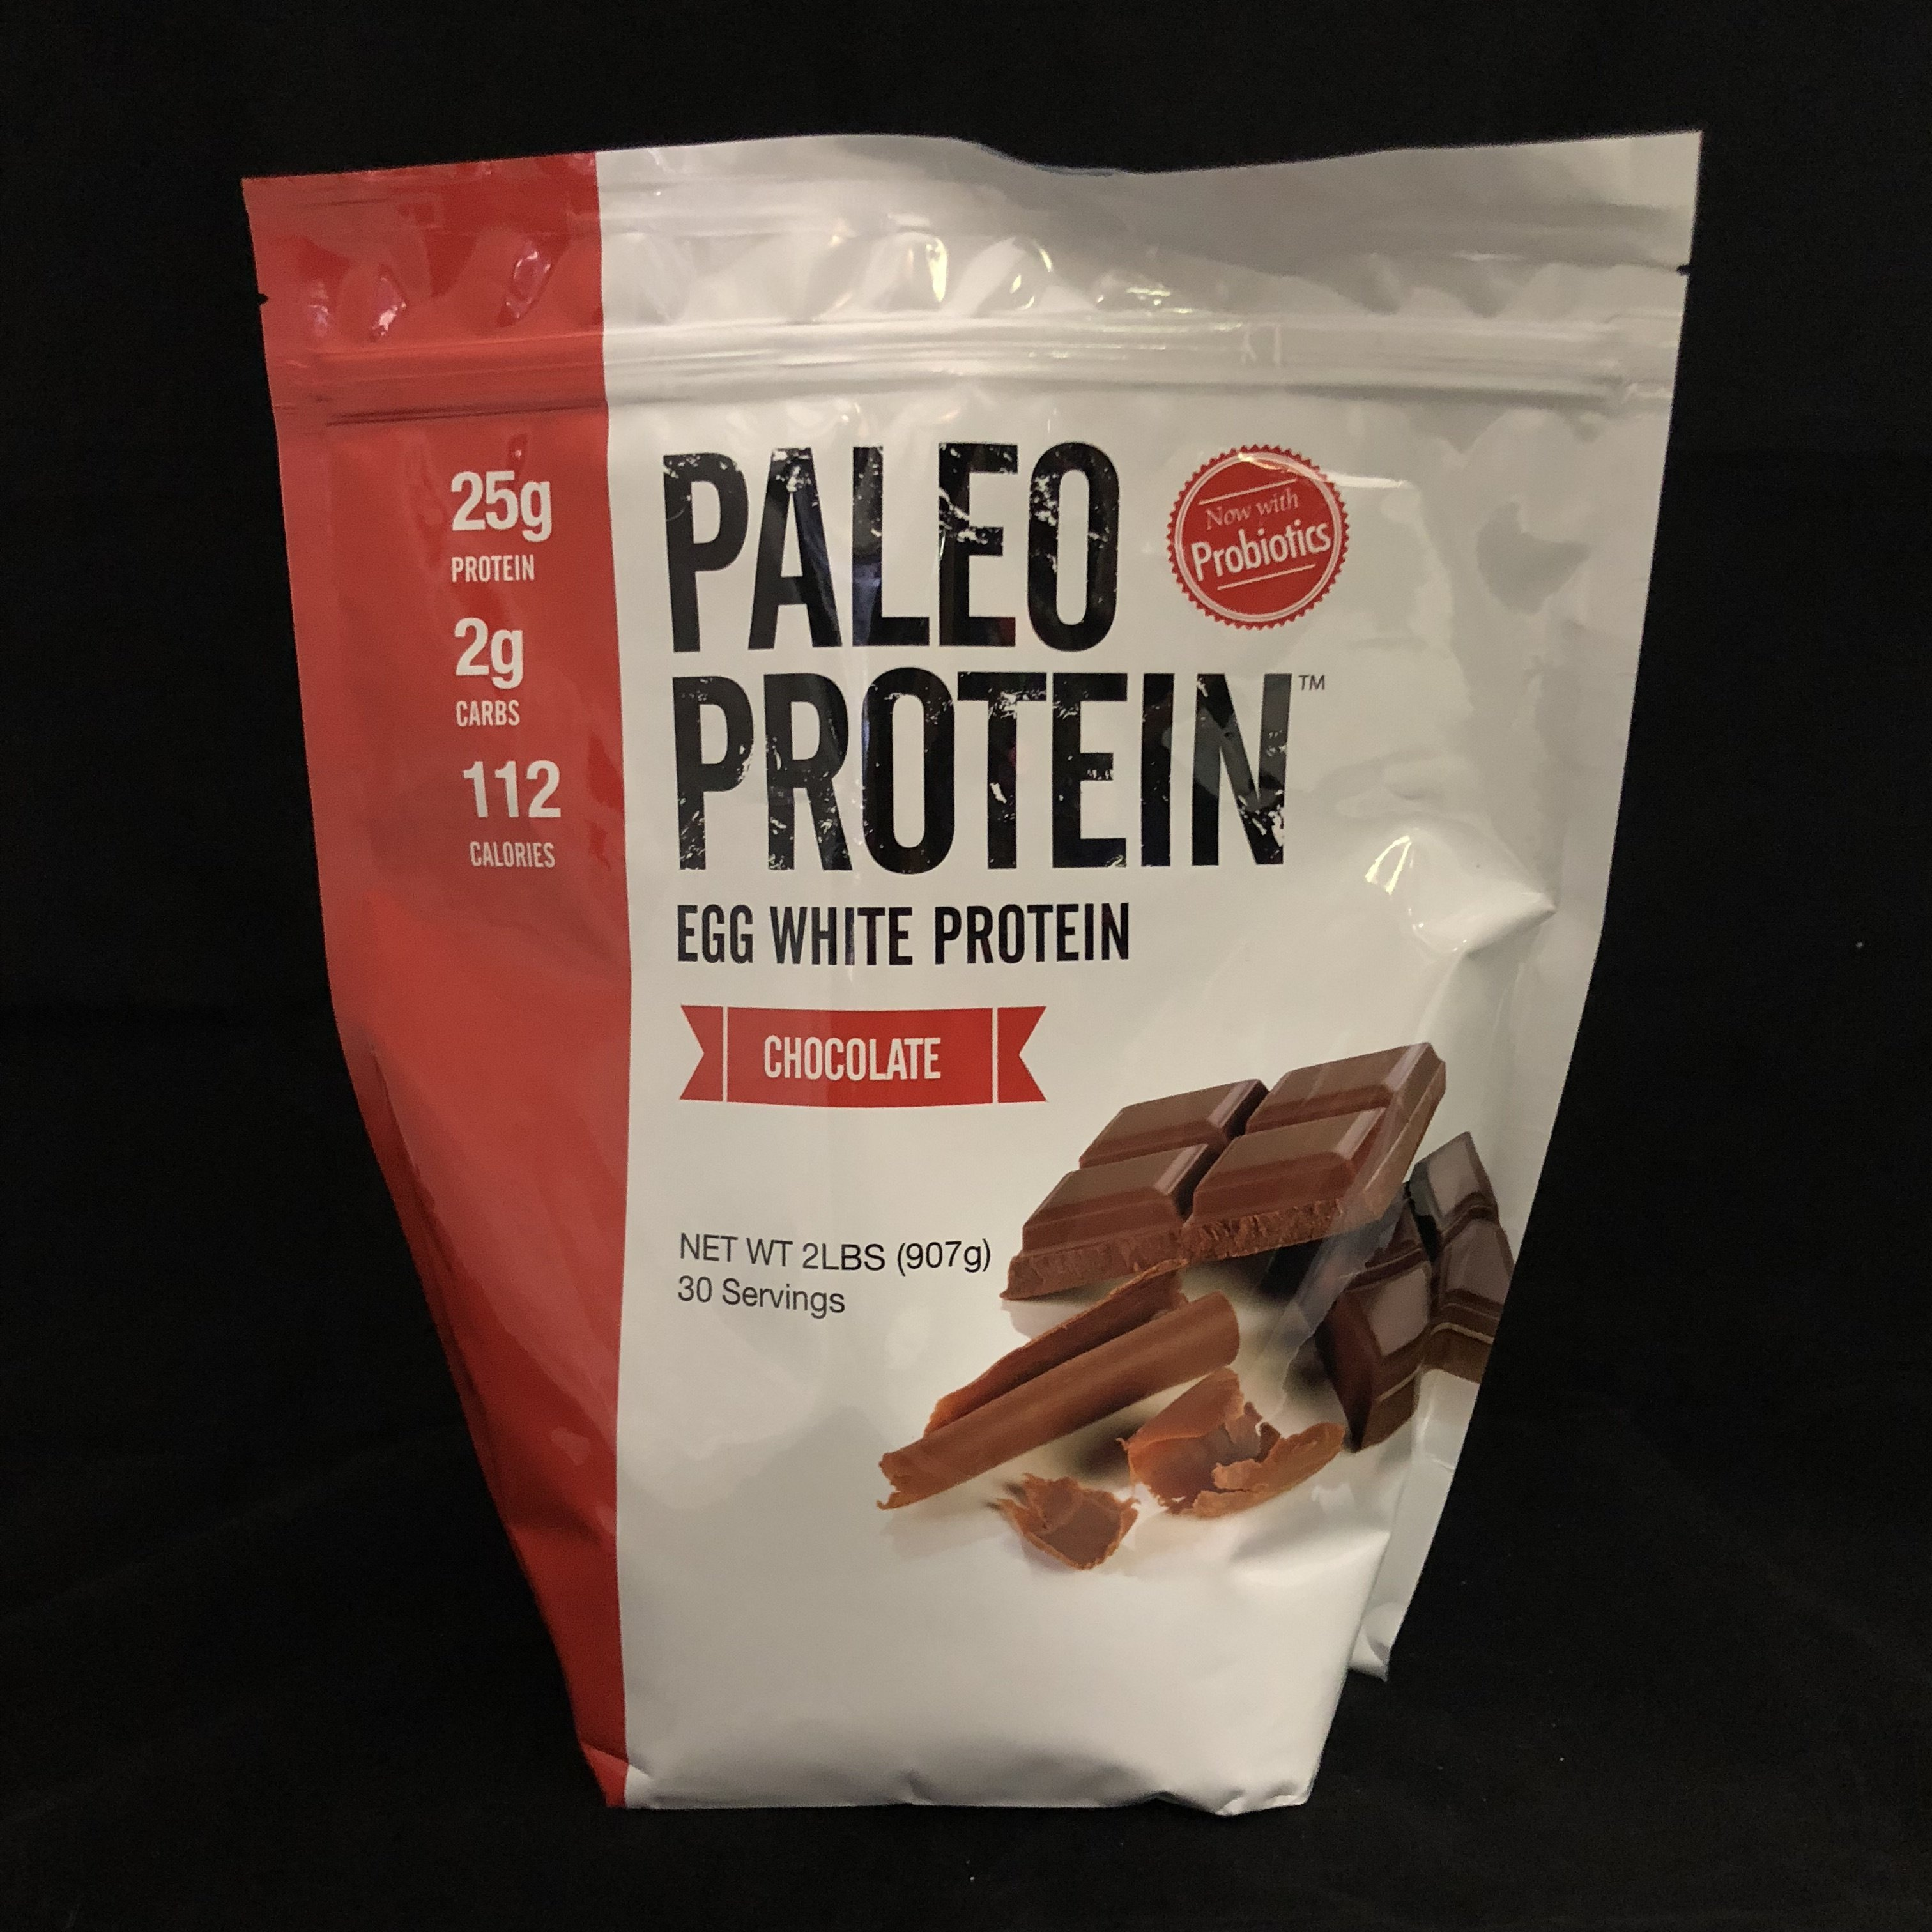 Paleo Protein Chocolate 813926002443